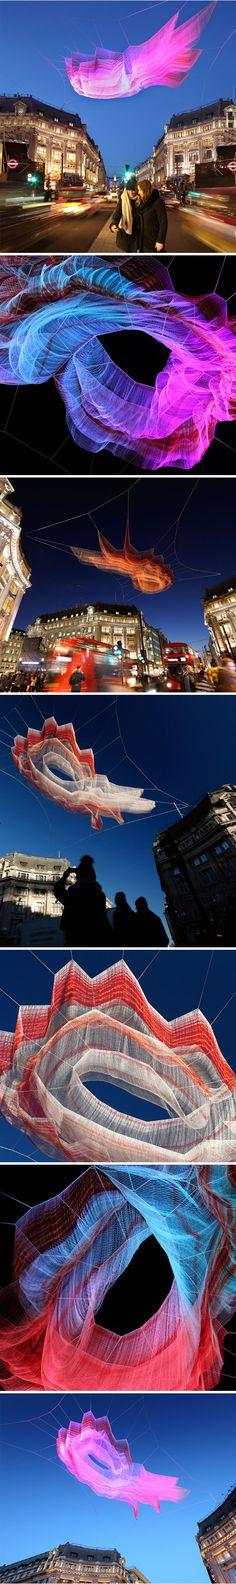 stunning installation in london by janet echelman